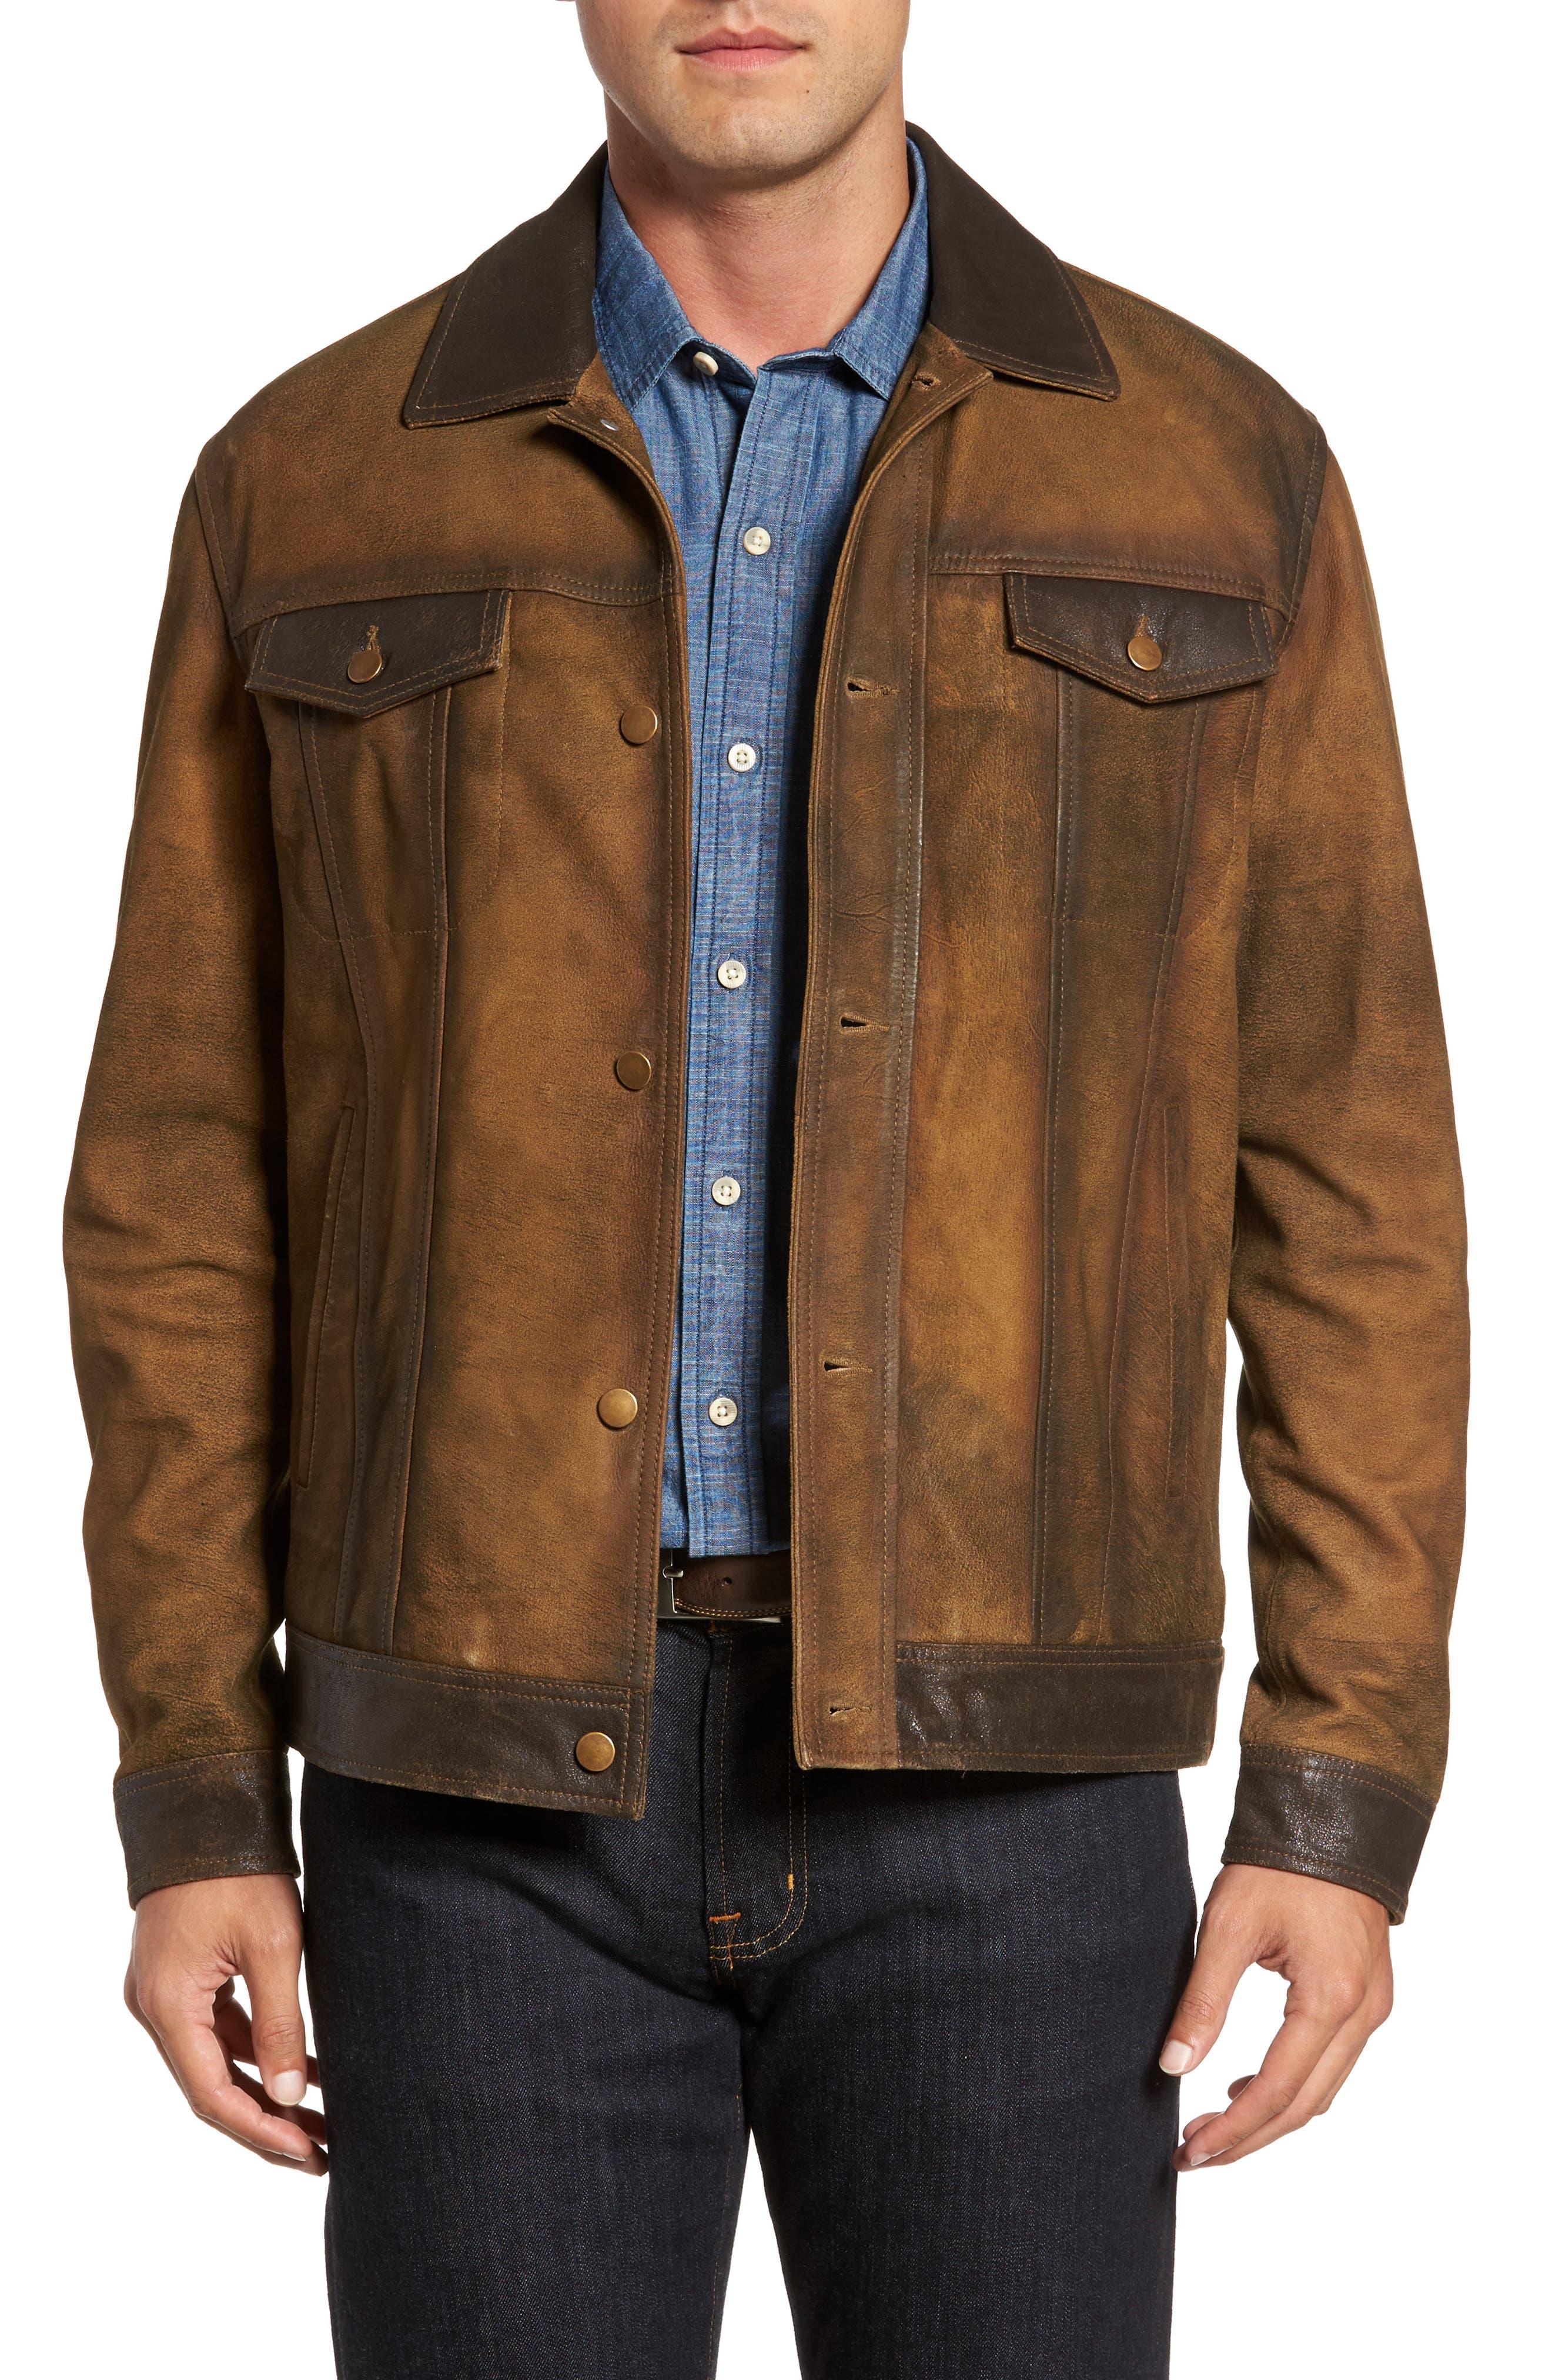 FLYNT Distressed Leather Trucker Jacket